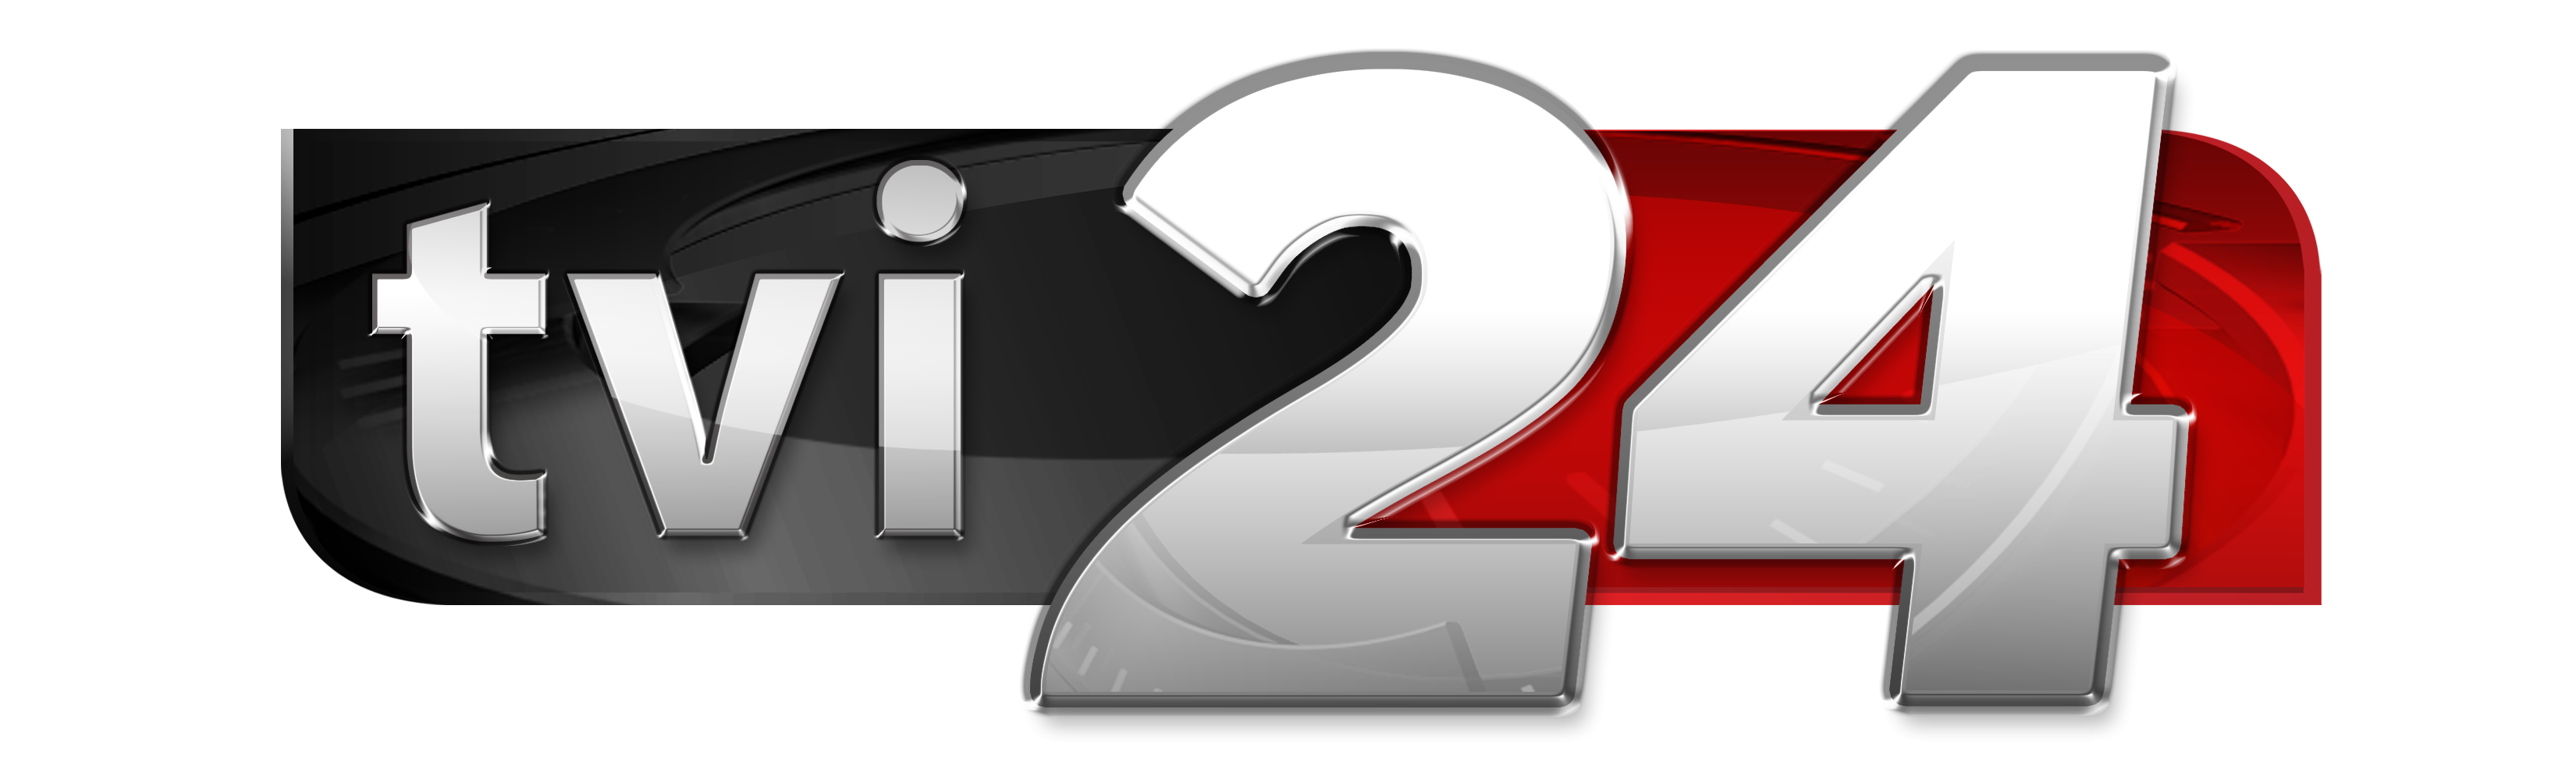 Novo Site TVI24 Reforça Informação Online da TVI